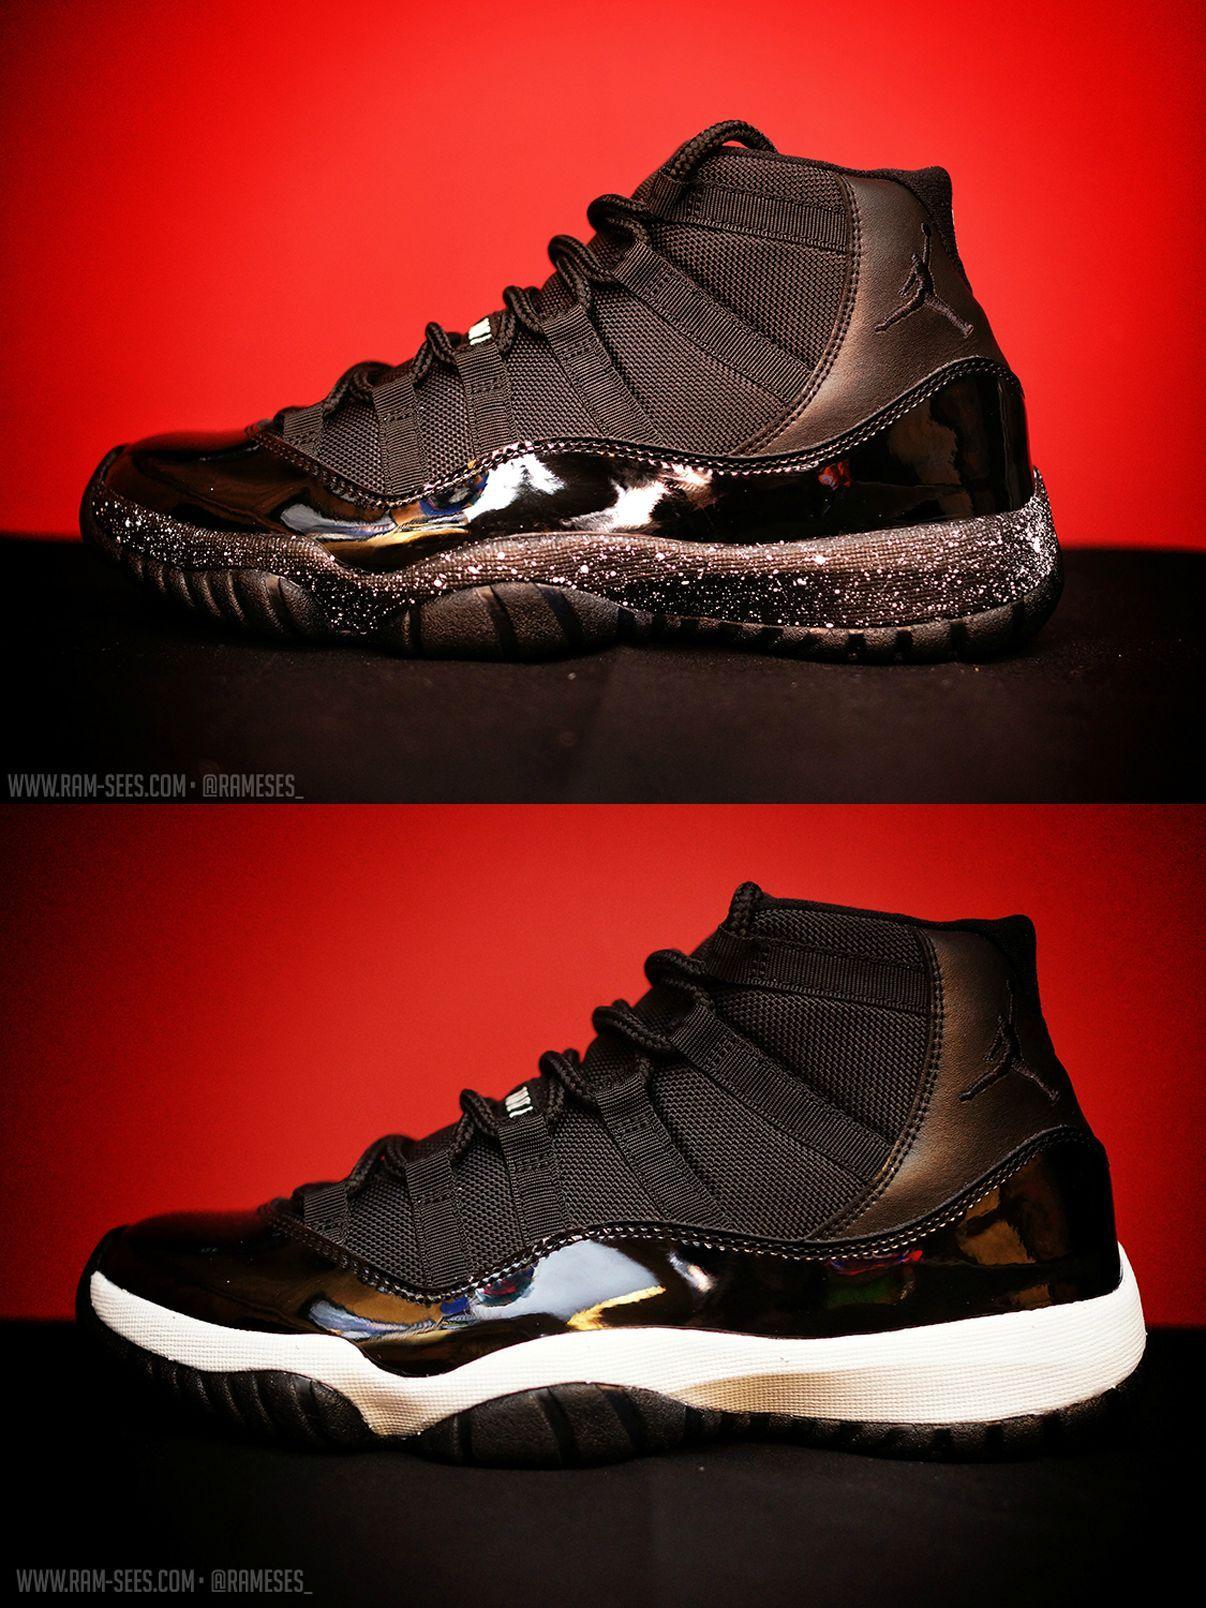 jordans #jordans ,Men\'s Jordan Shoes,Women\'s Jordan Shoes,Kid\'s